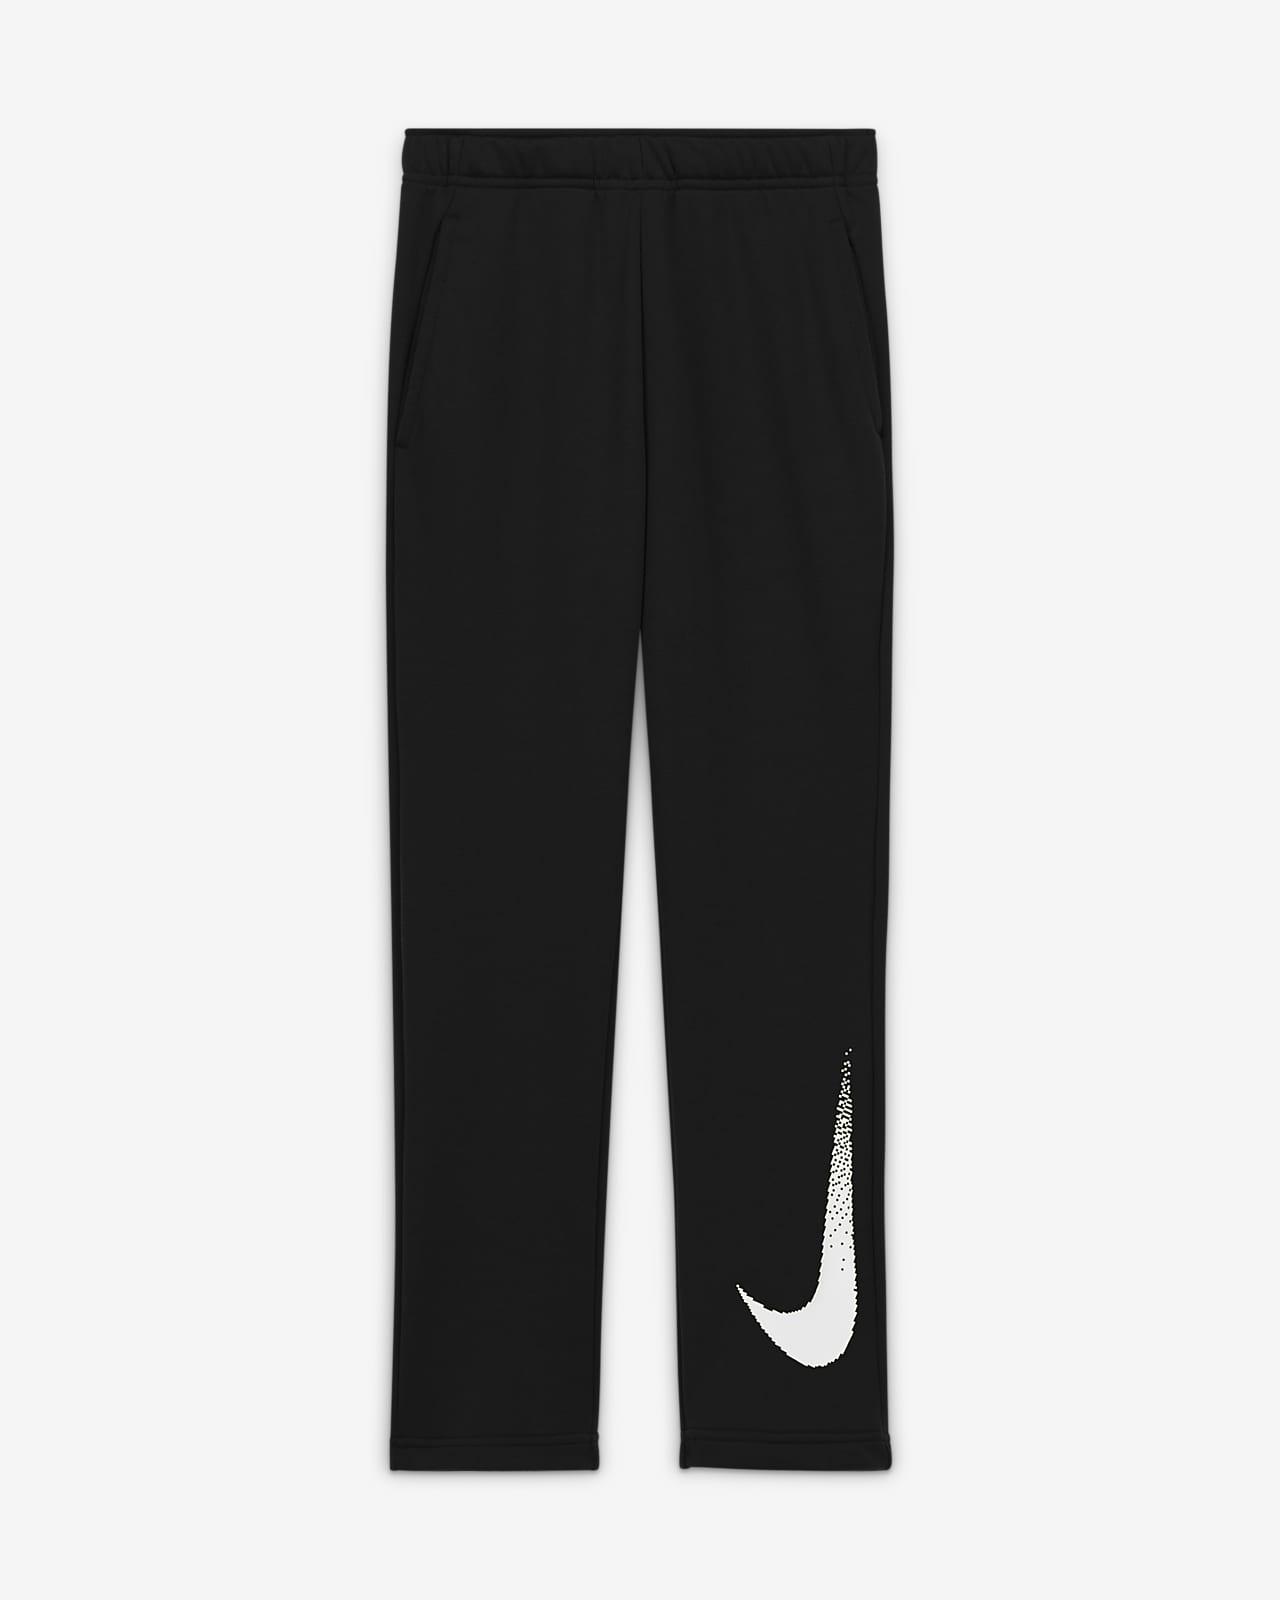 va a decidir ensayo hacer clic  Pantaloni in fleece con grafica Nike Dri-FIT - Ragazzo. Nike CH